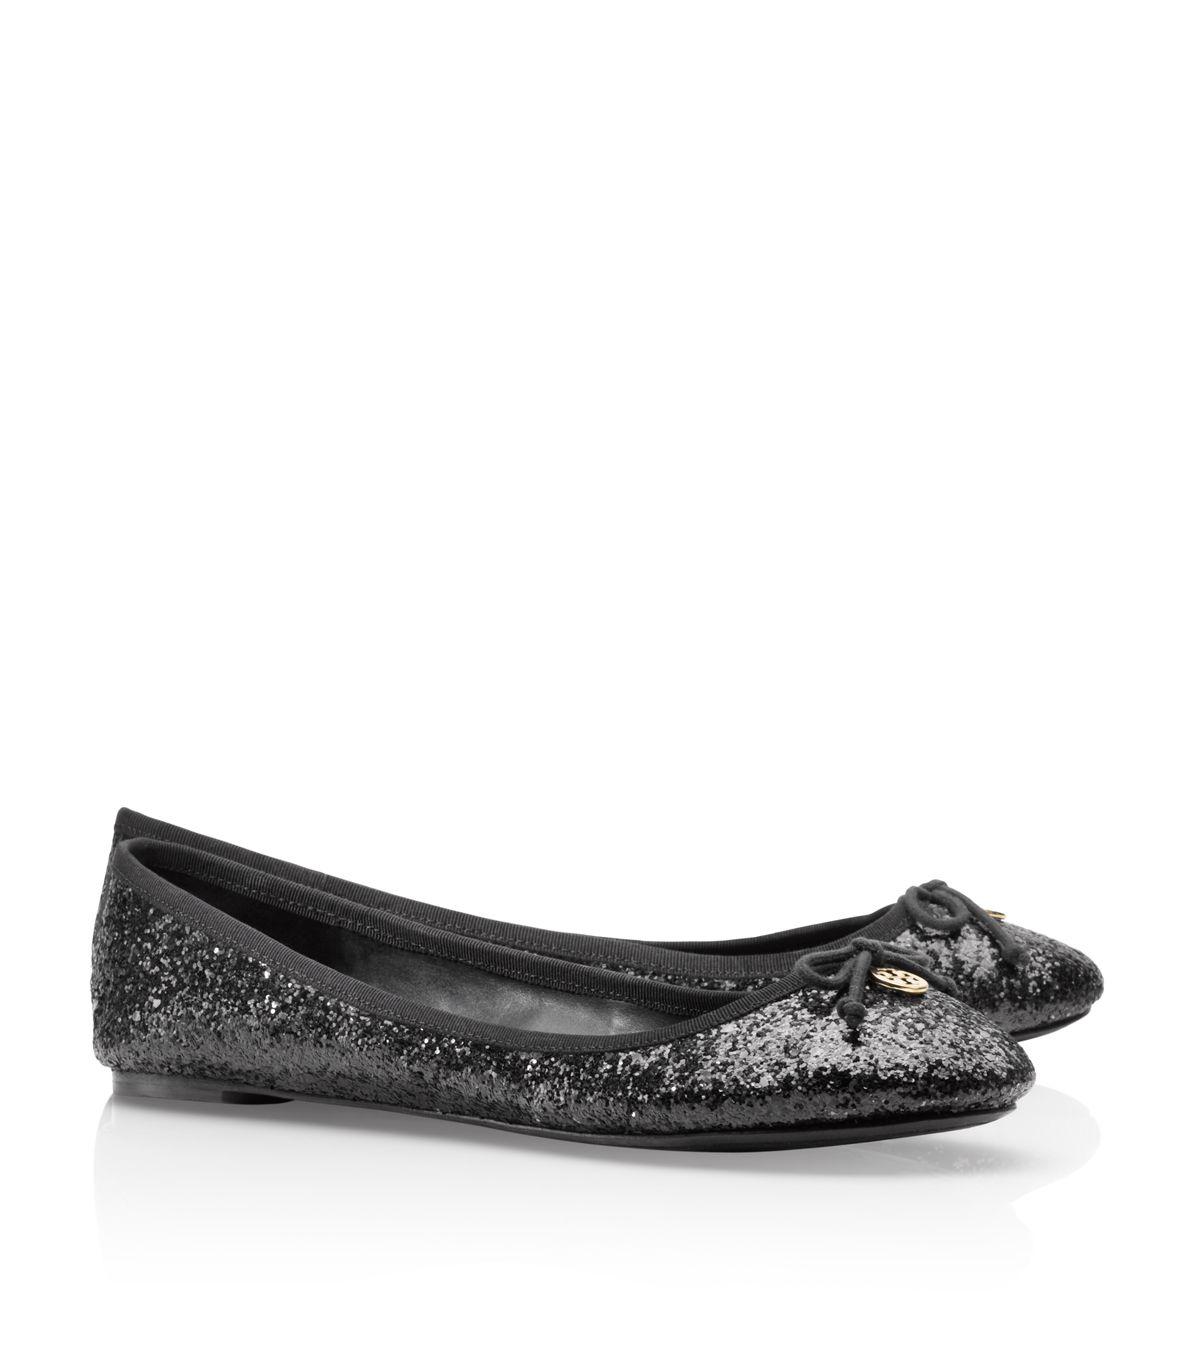 c74e09a667d2 Tory Burch Chelsea Glitter Ballet Flat in Black - Lyst